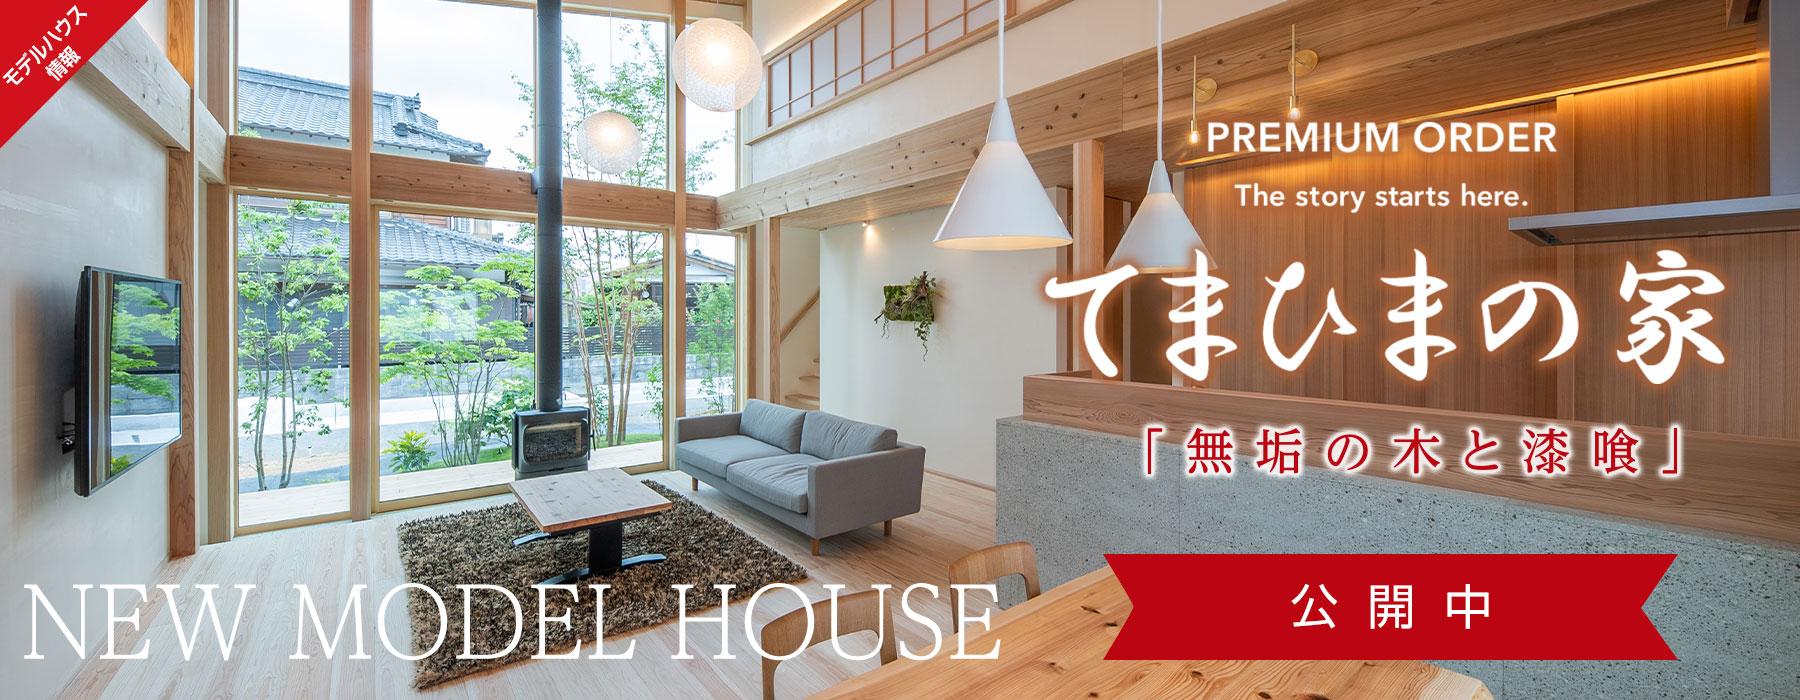 NEWMODEL HOUSEてまひまの家「無垢の木と漆喰」2021.5.28公開